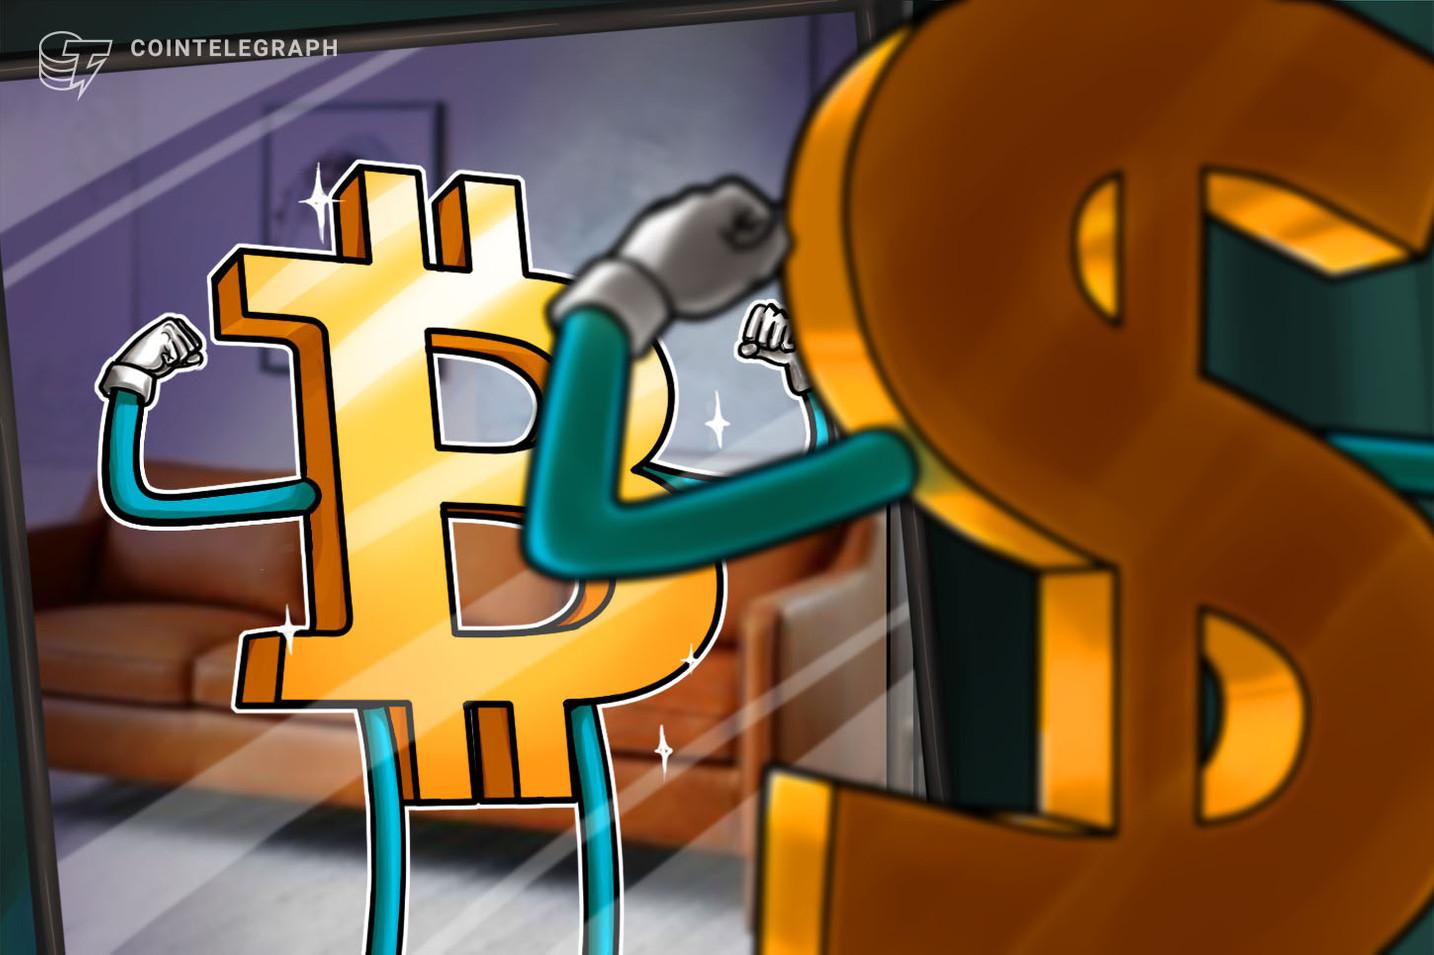 Bitcoin 가격은 $ 38에 집착하지만 Dollar Index의 반등은 BTC에 압력을 가할 수 있습니다